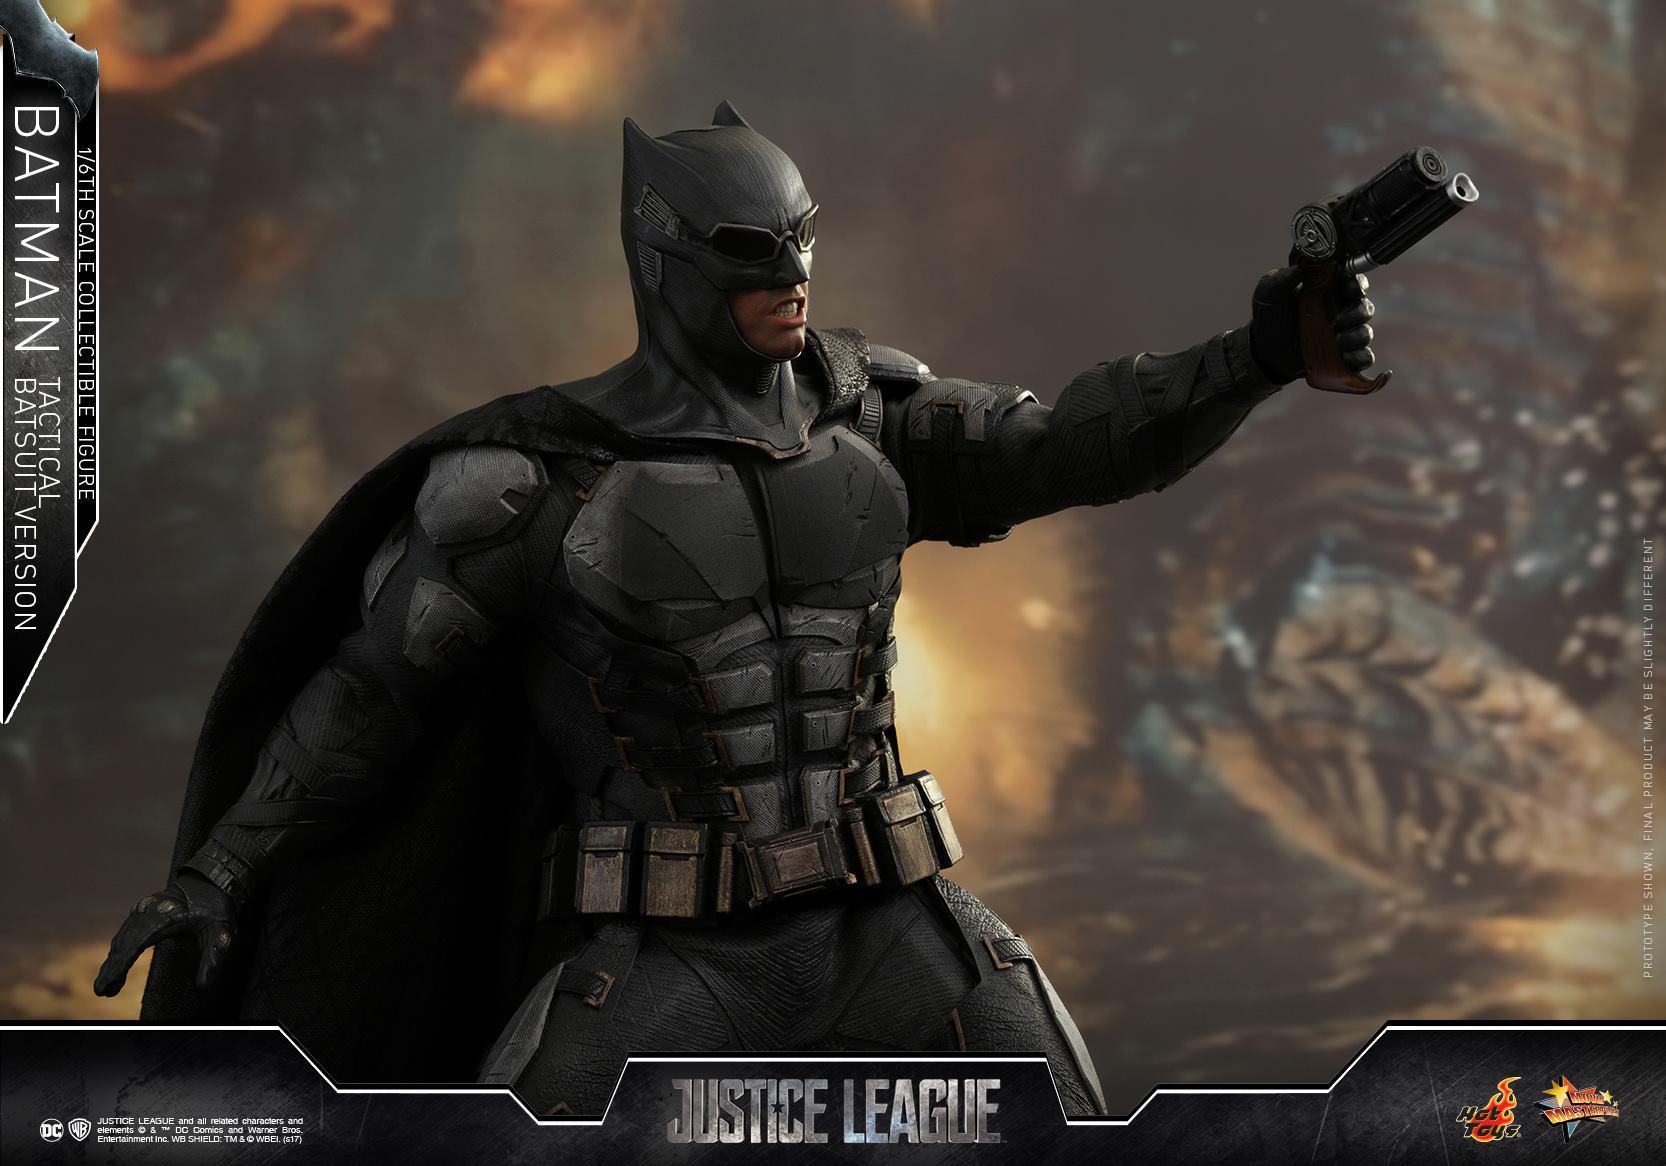 Hot Toys 1//6 MMS432 Justice League Batman Goggles #1 Tactical Batsuit